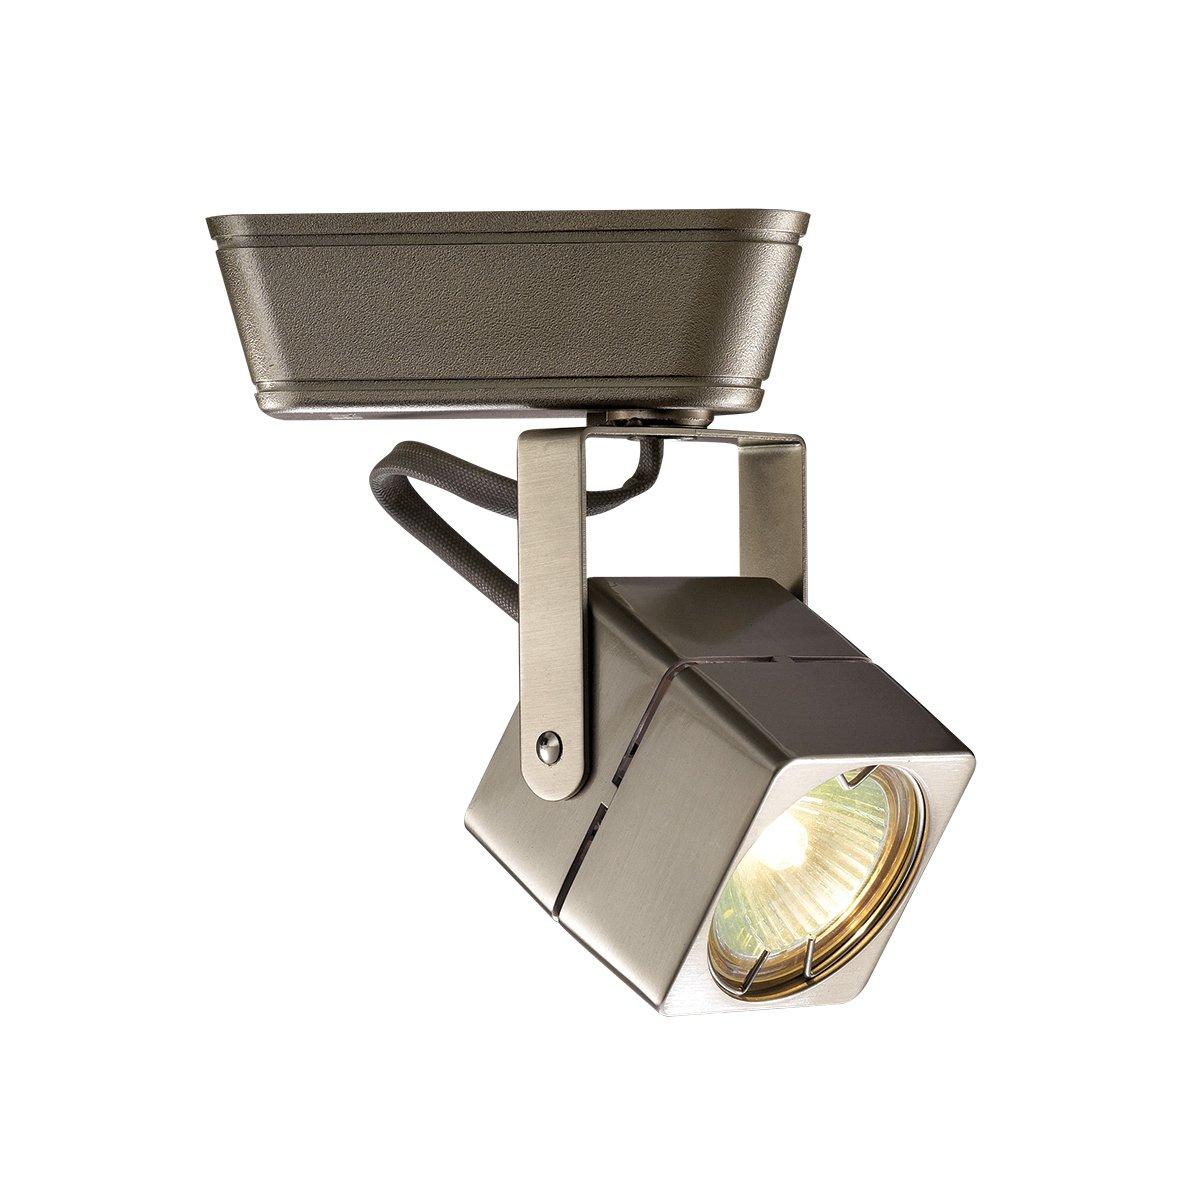 WAC Lighting HHT-802-BN H Series Low Voltage Track Head, 50W